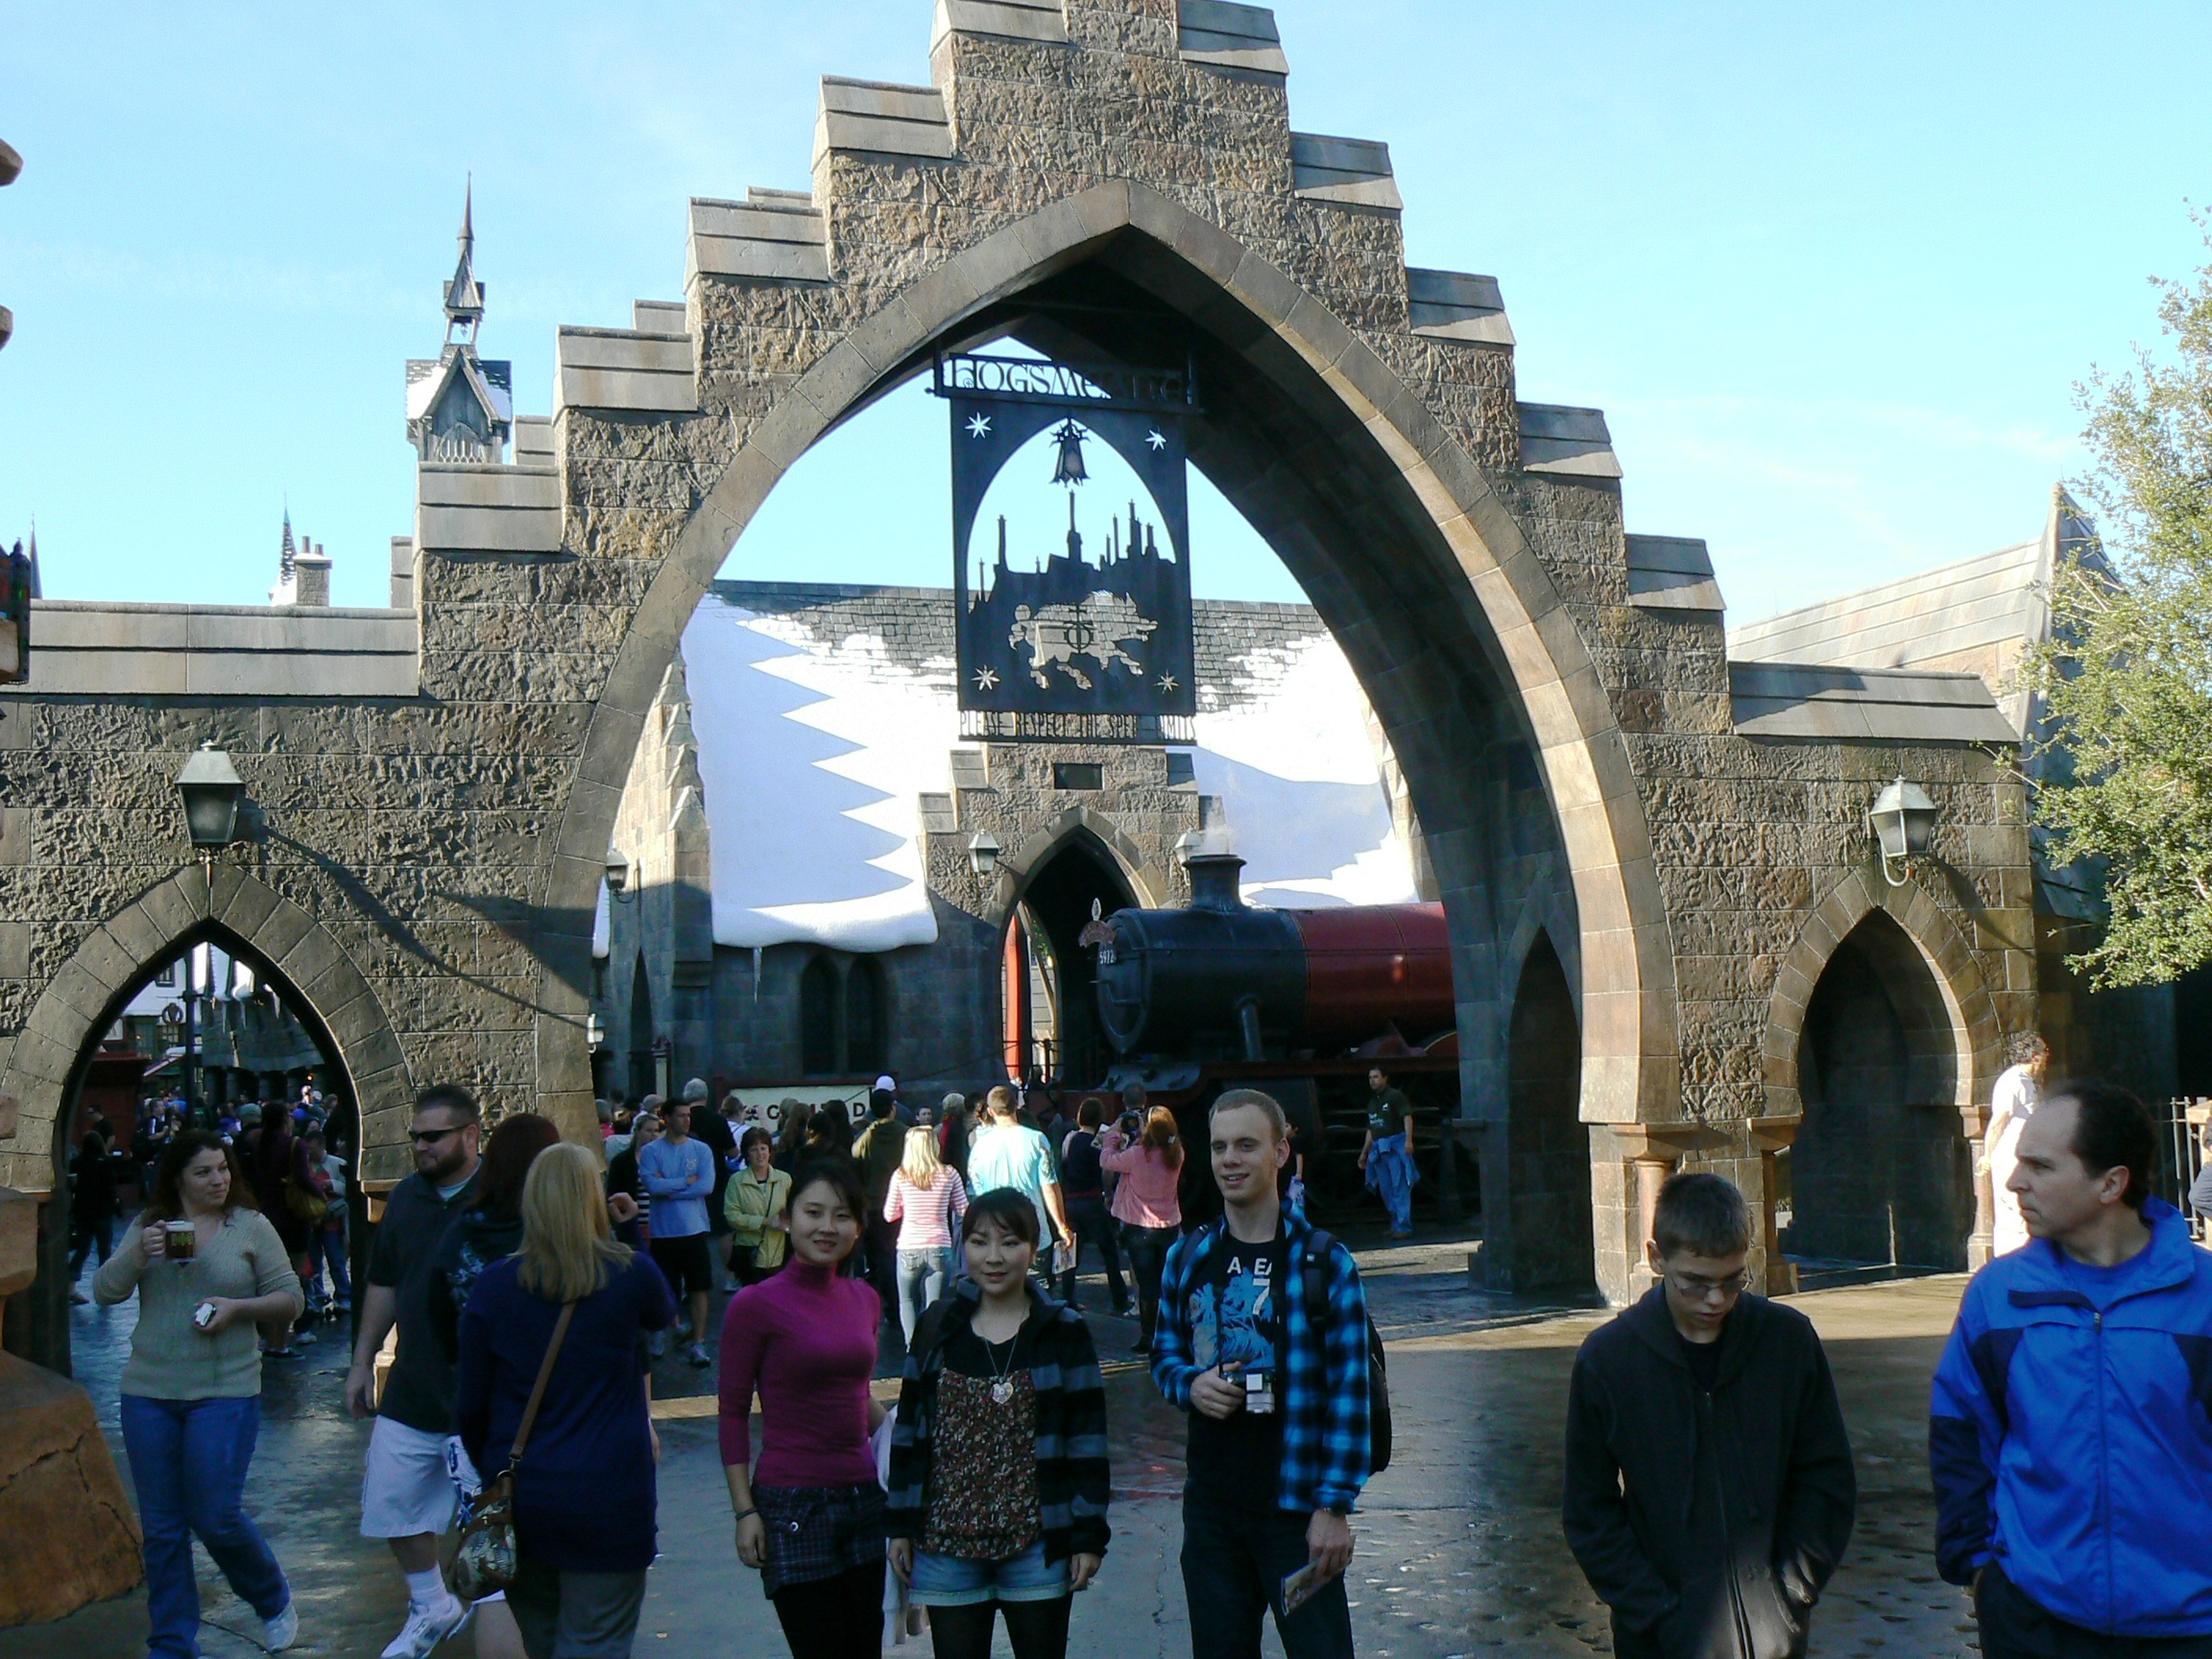 Harry Potter Universal Studios Consumer Travel Advice